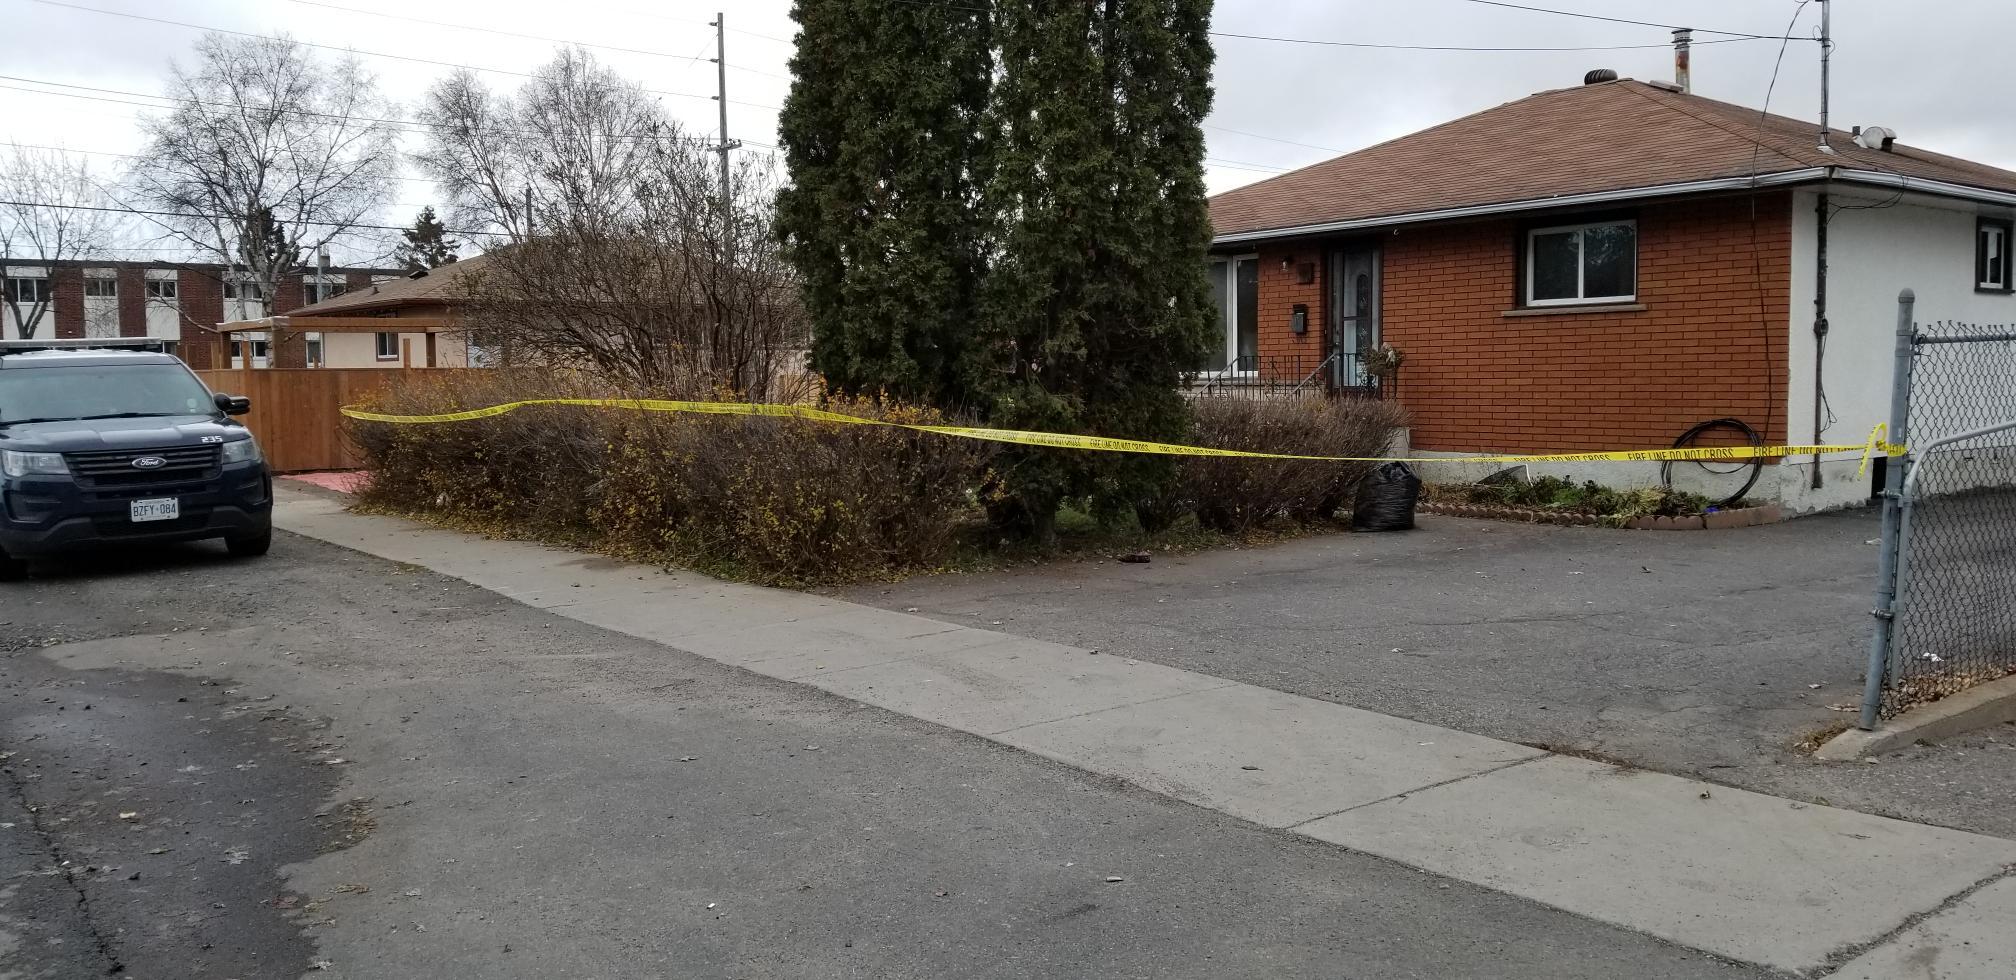 Walkover Fire Victim Dies